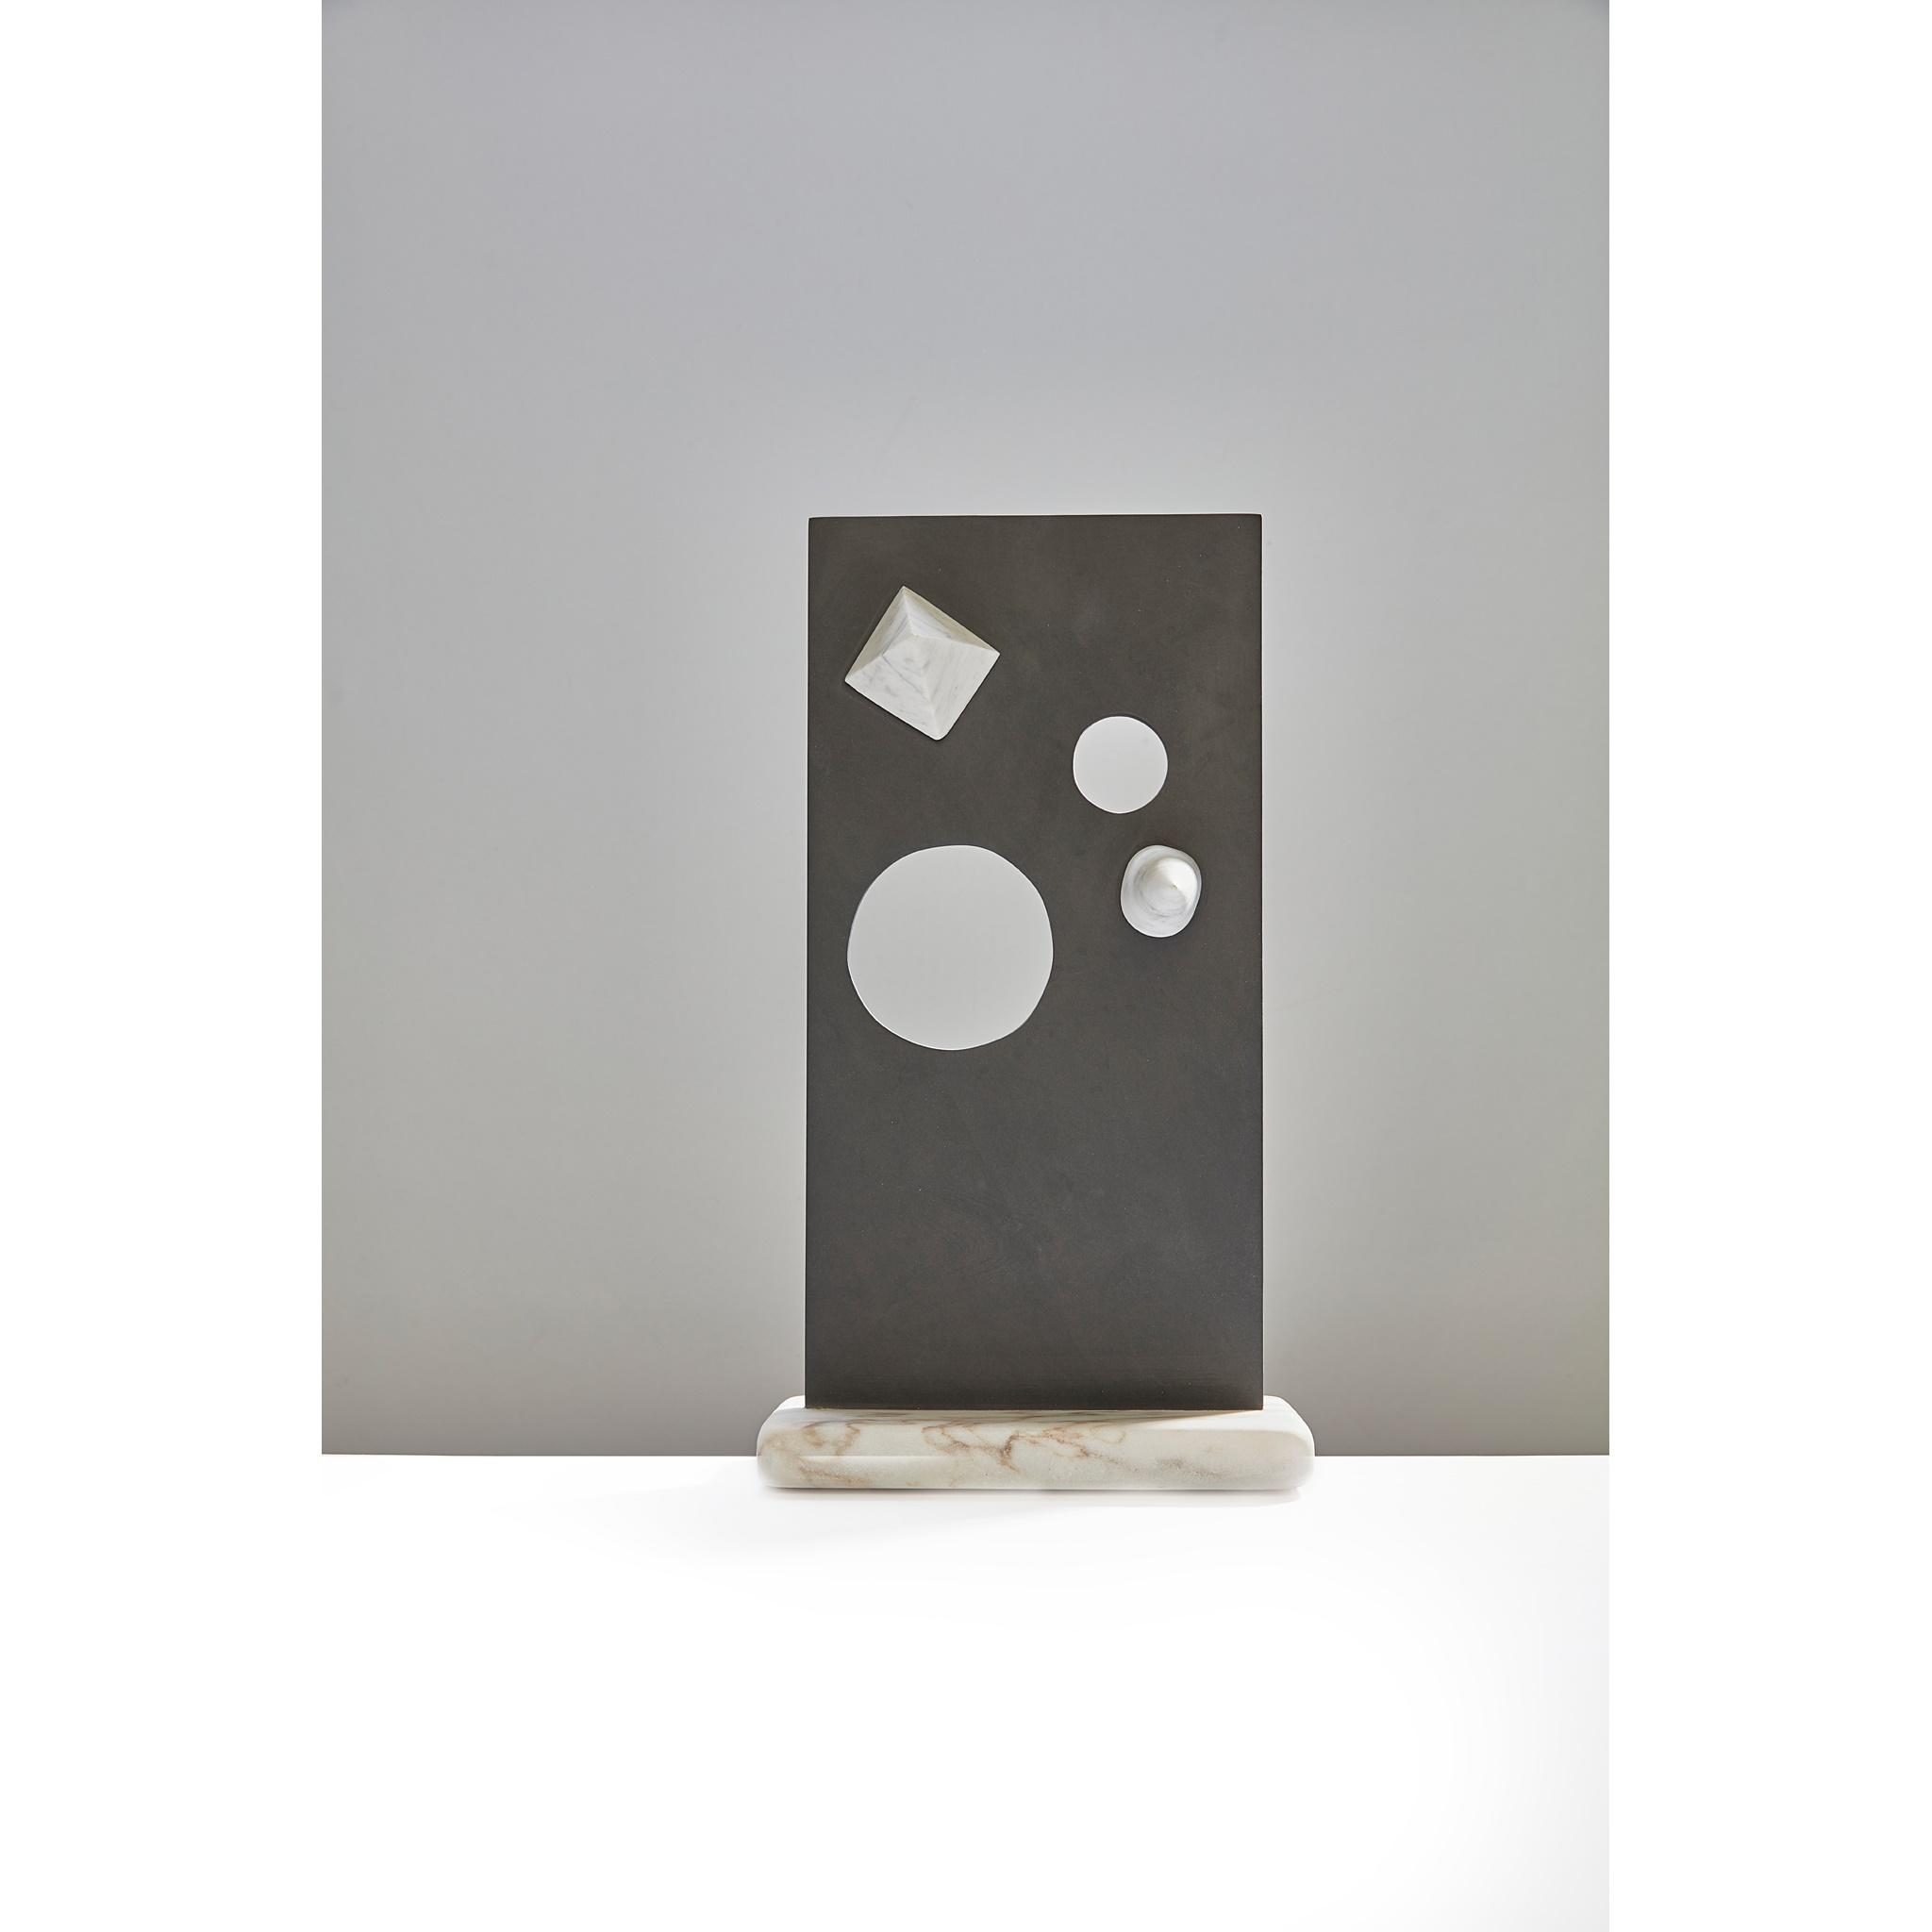 SIMON BURNS-COX (BRITISH 1962-) FIVE DIMENSIONS - Image 4 of 6